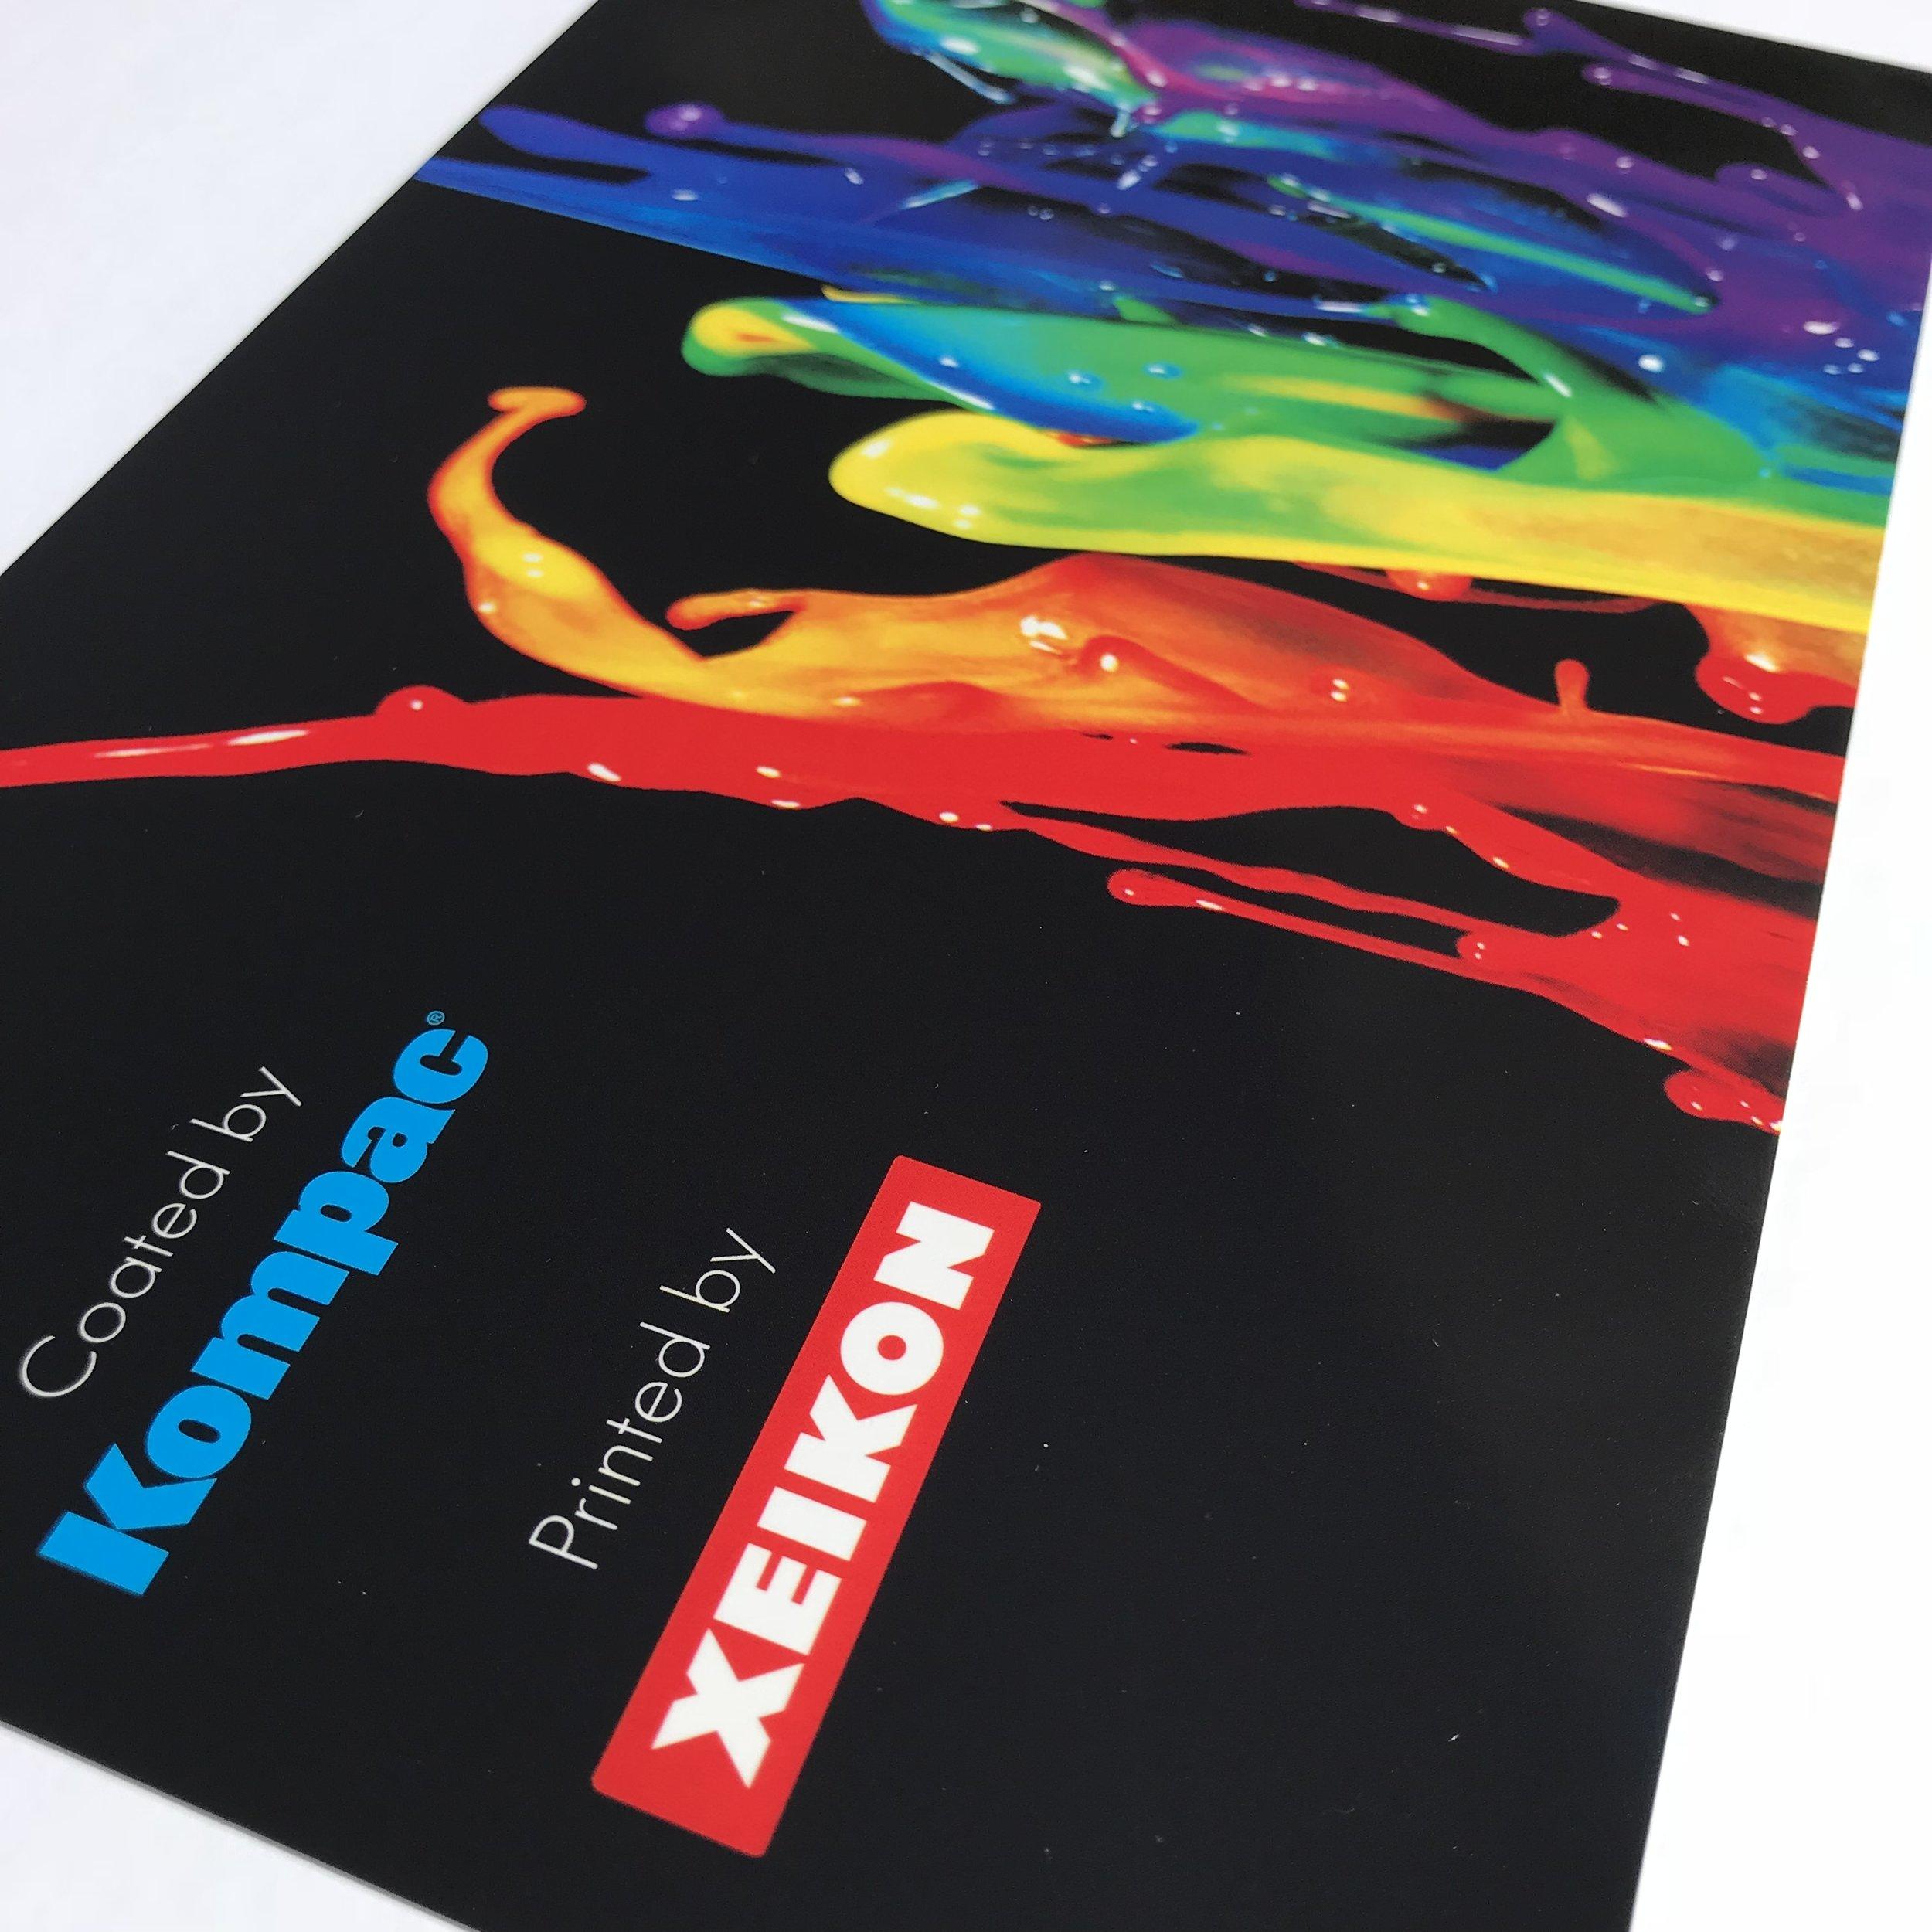 Kompac_Xeikon_Digital_Printing_Coating_Coater.jpg